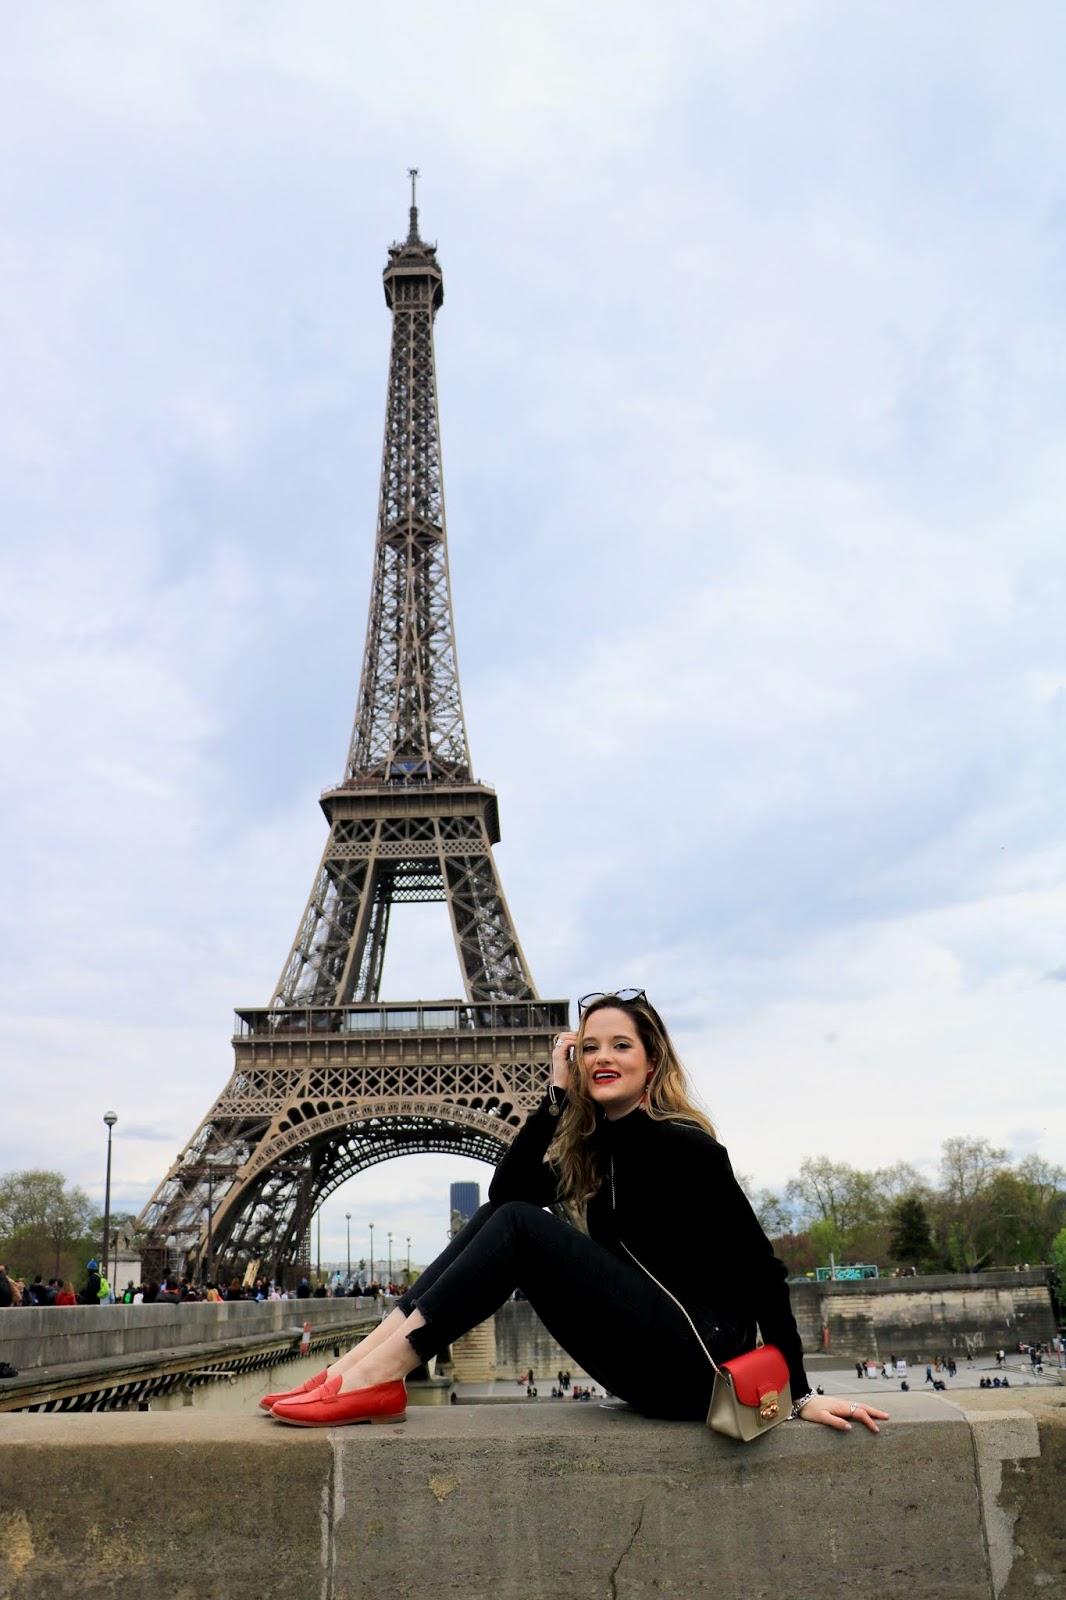 Eiffel-Tower fashion blogger pics